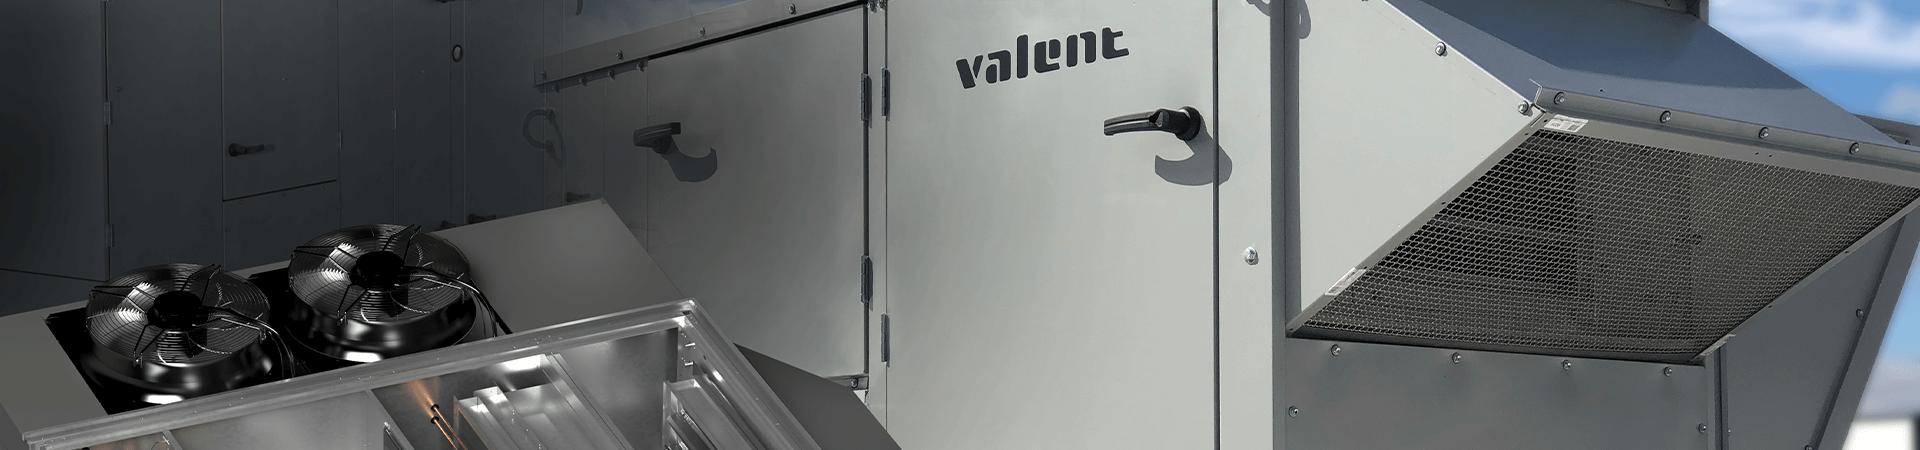 Valent-Products_NoText_1920x450_Tiny